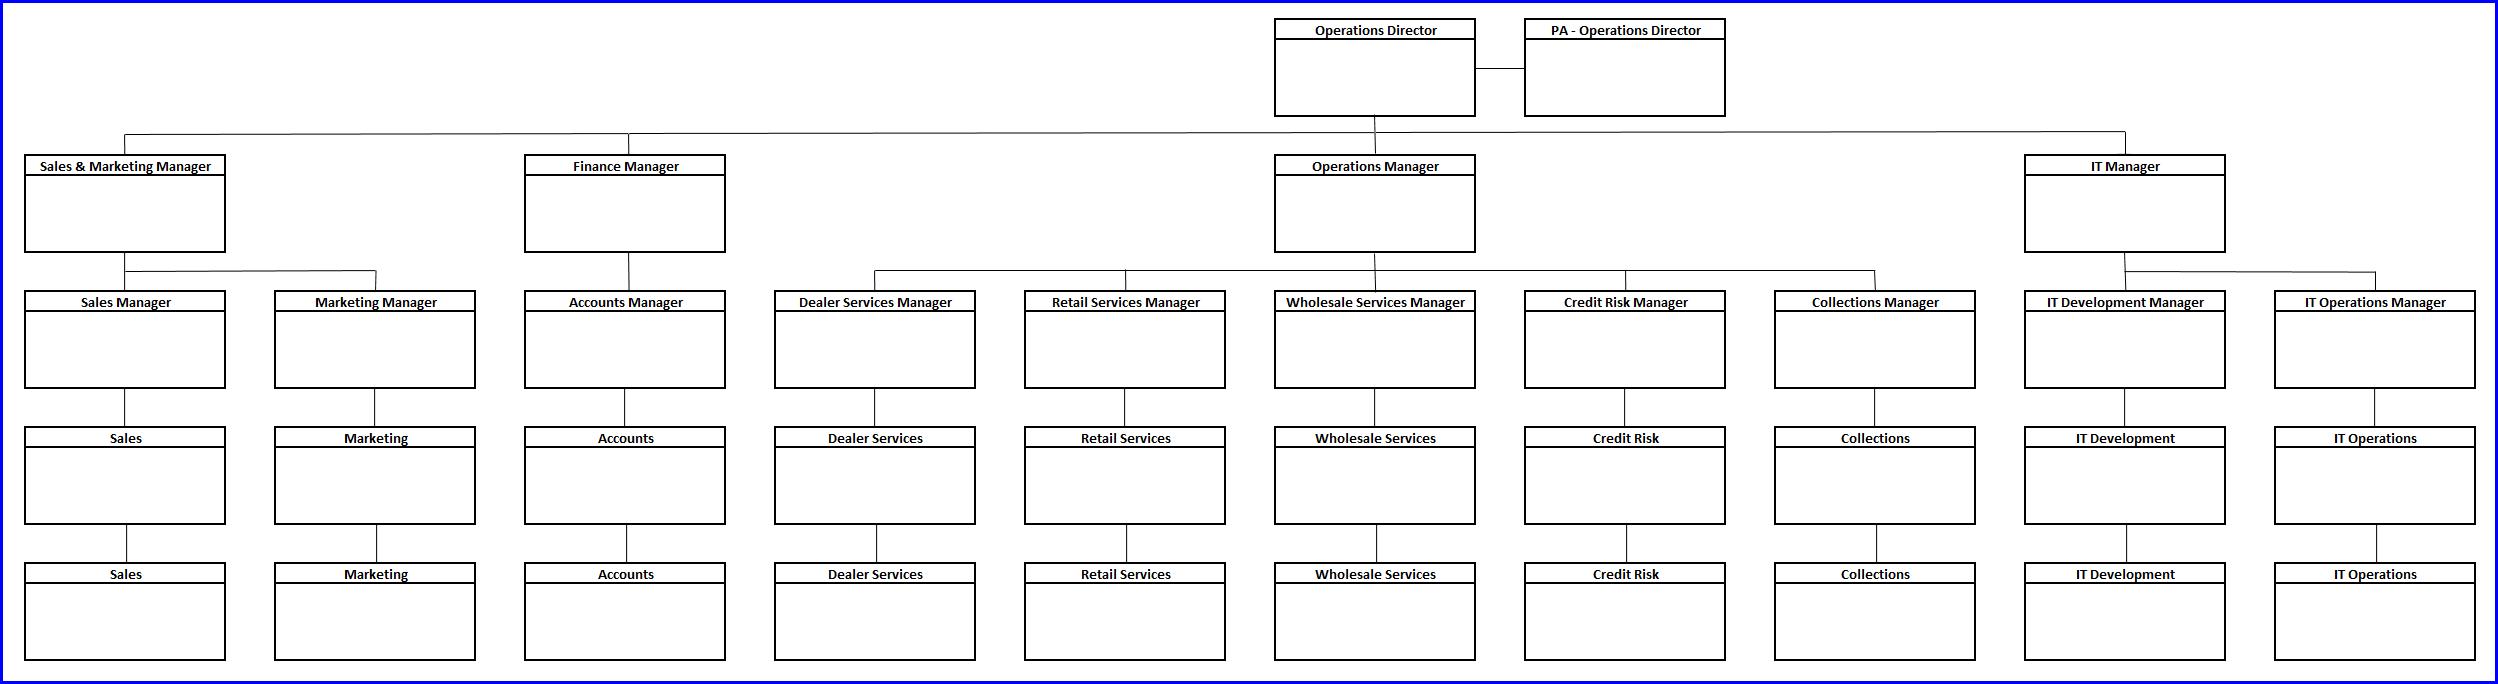 Organisation Chart 11